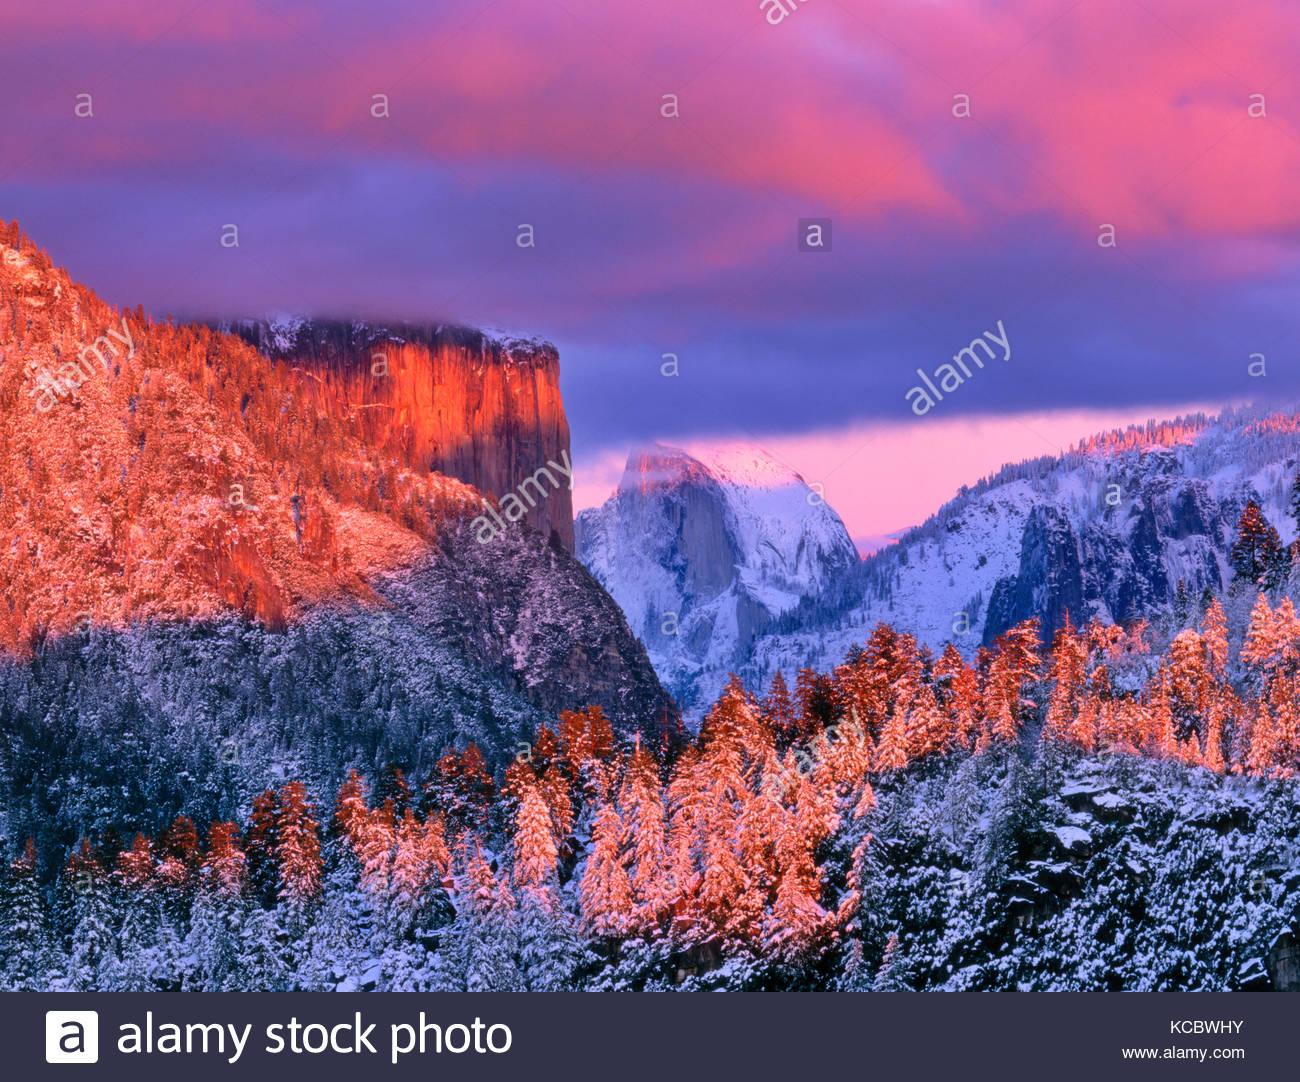 El Capitan and Half Dome  at Sunset,Yosemite National Park, California - Stock Image